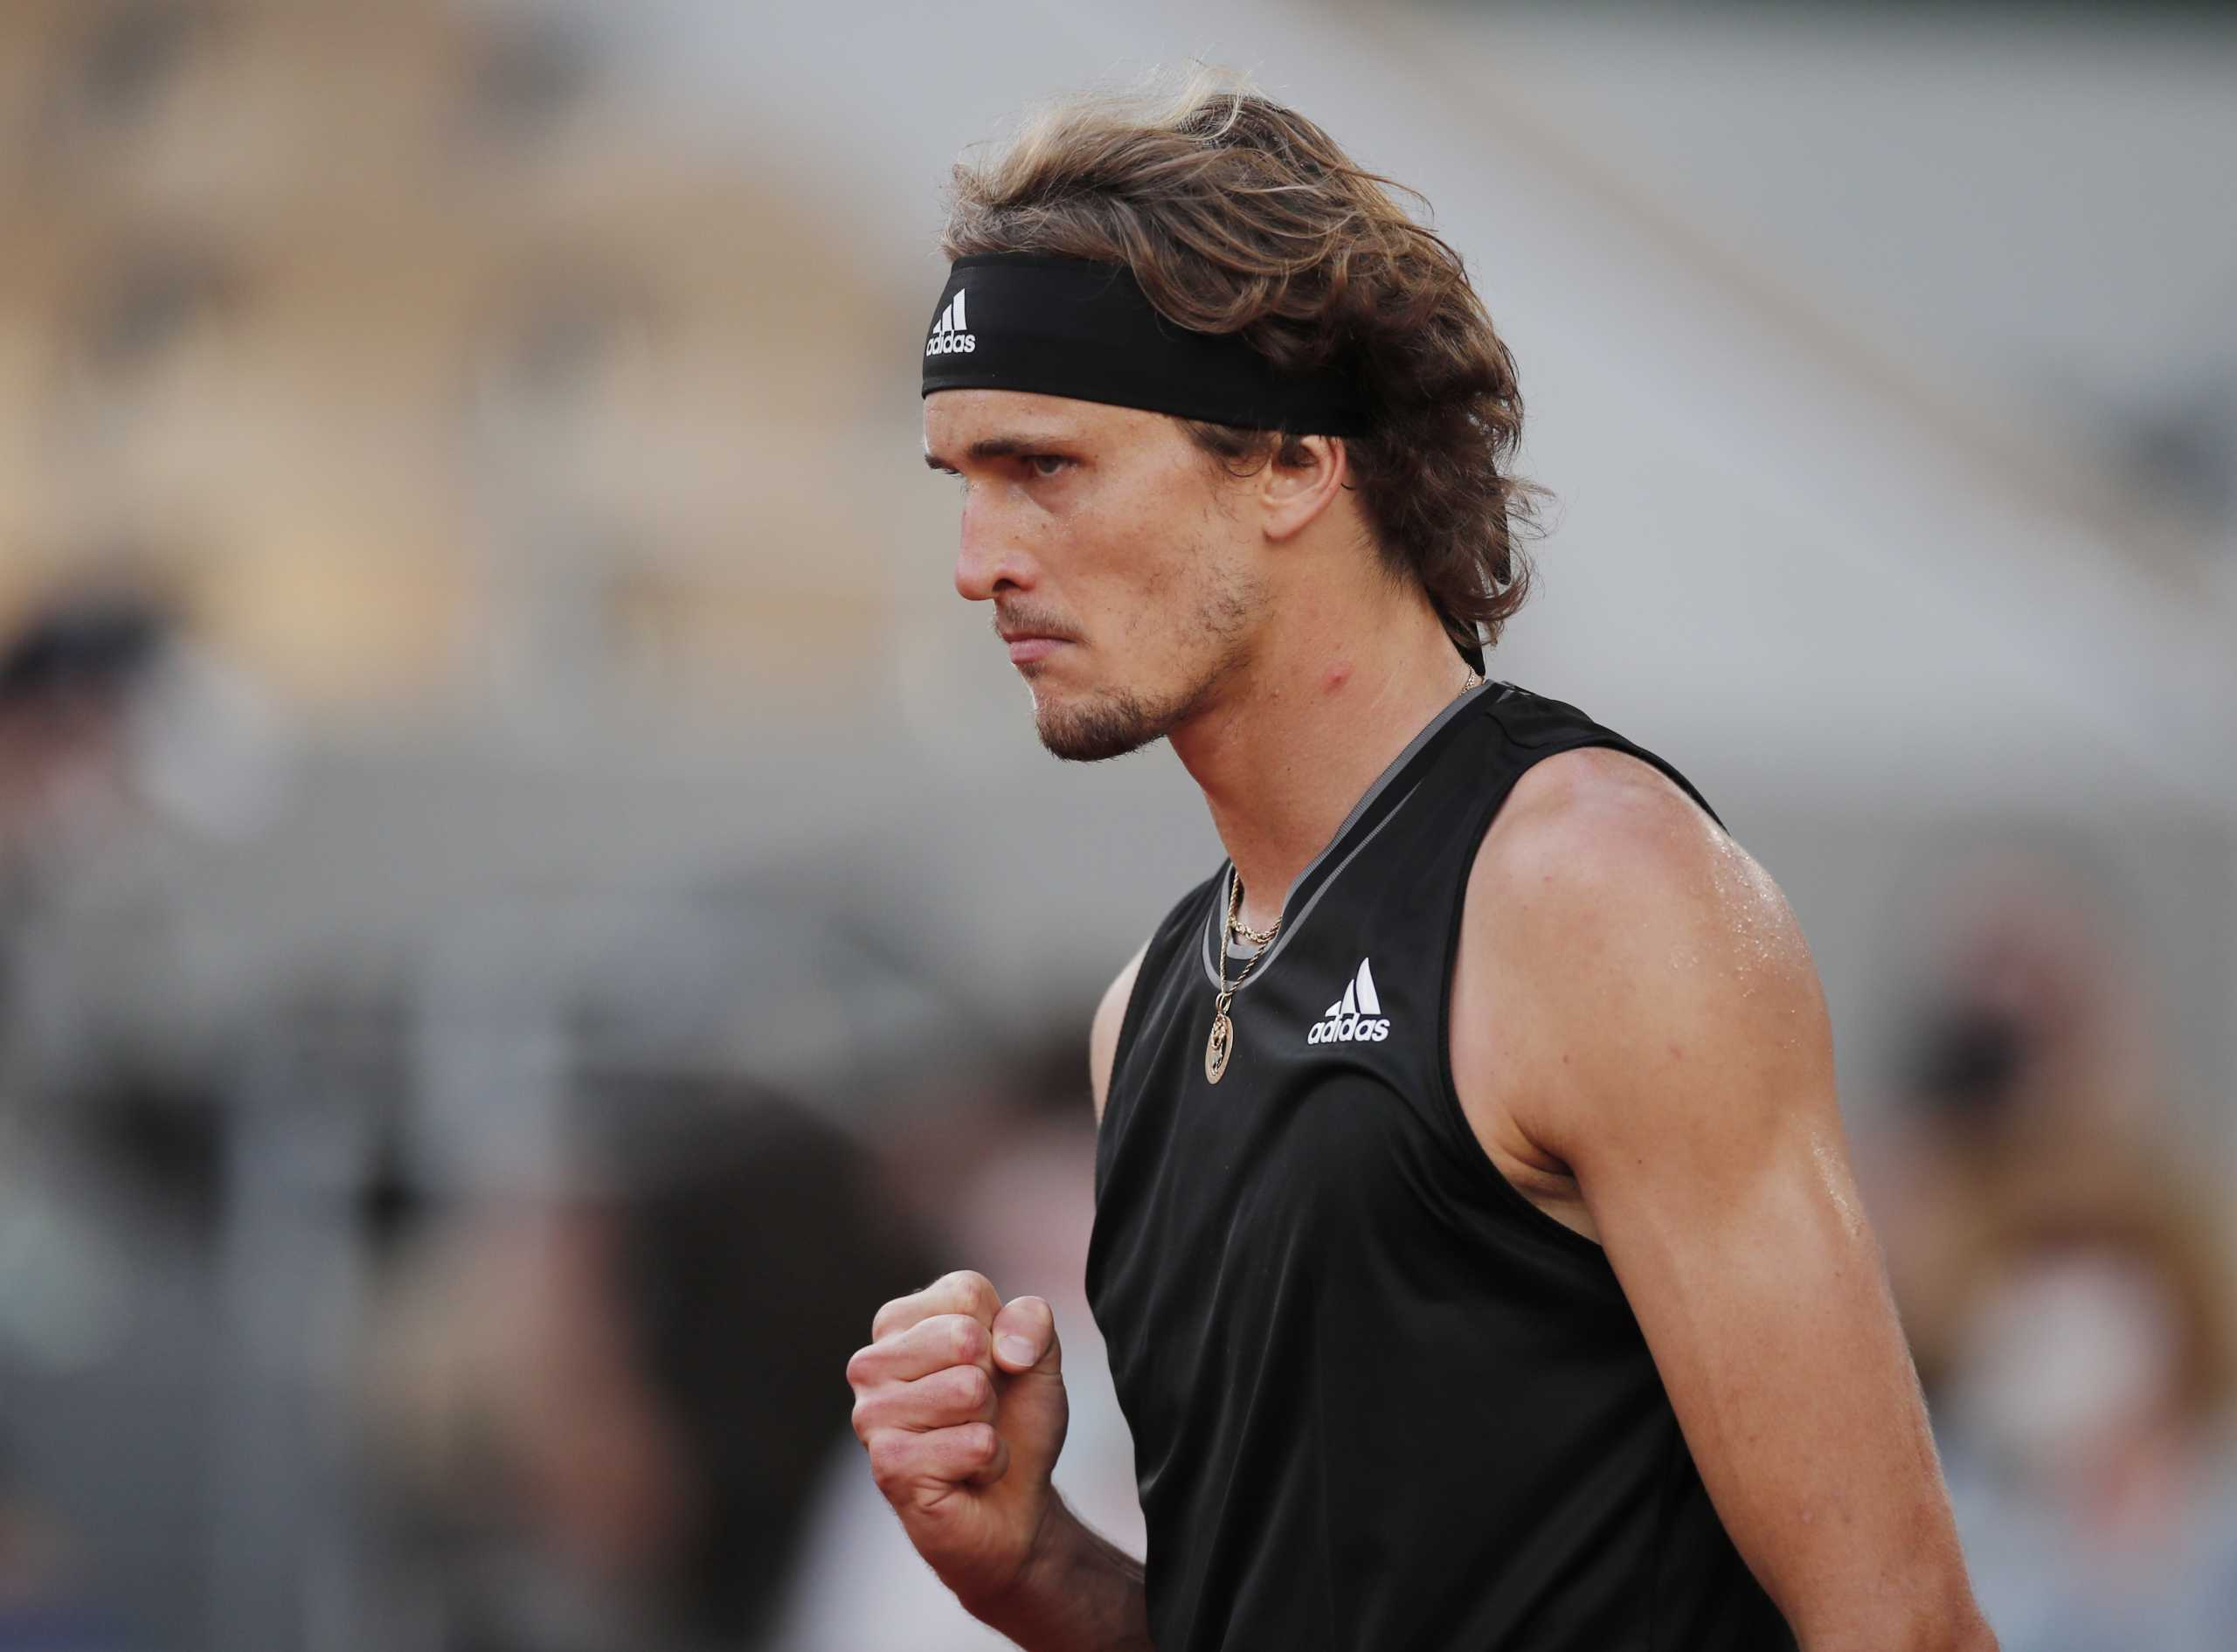 Roland Garros: Στα ημιτελικά ο Ζβέρεφ, περιμένει τον Τσιτσιπά